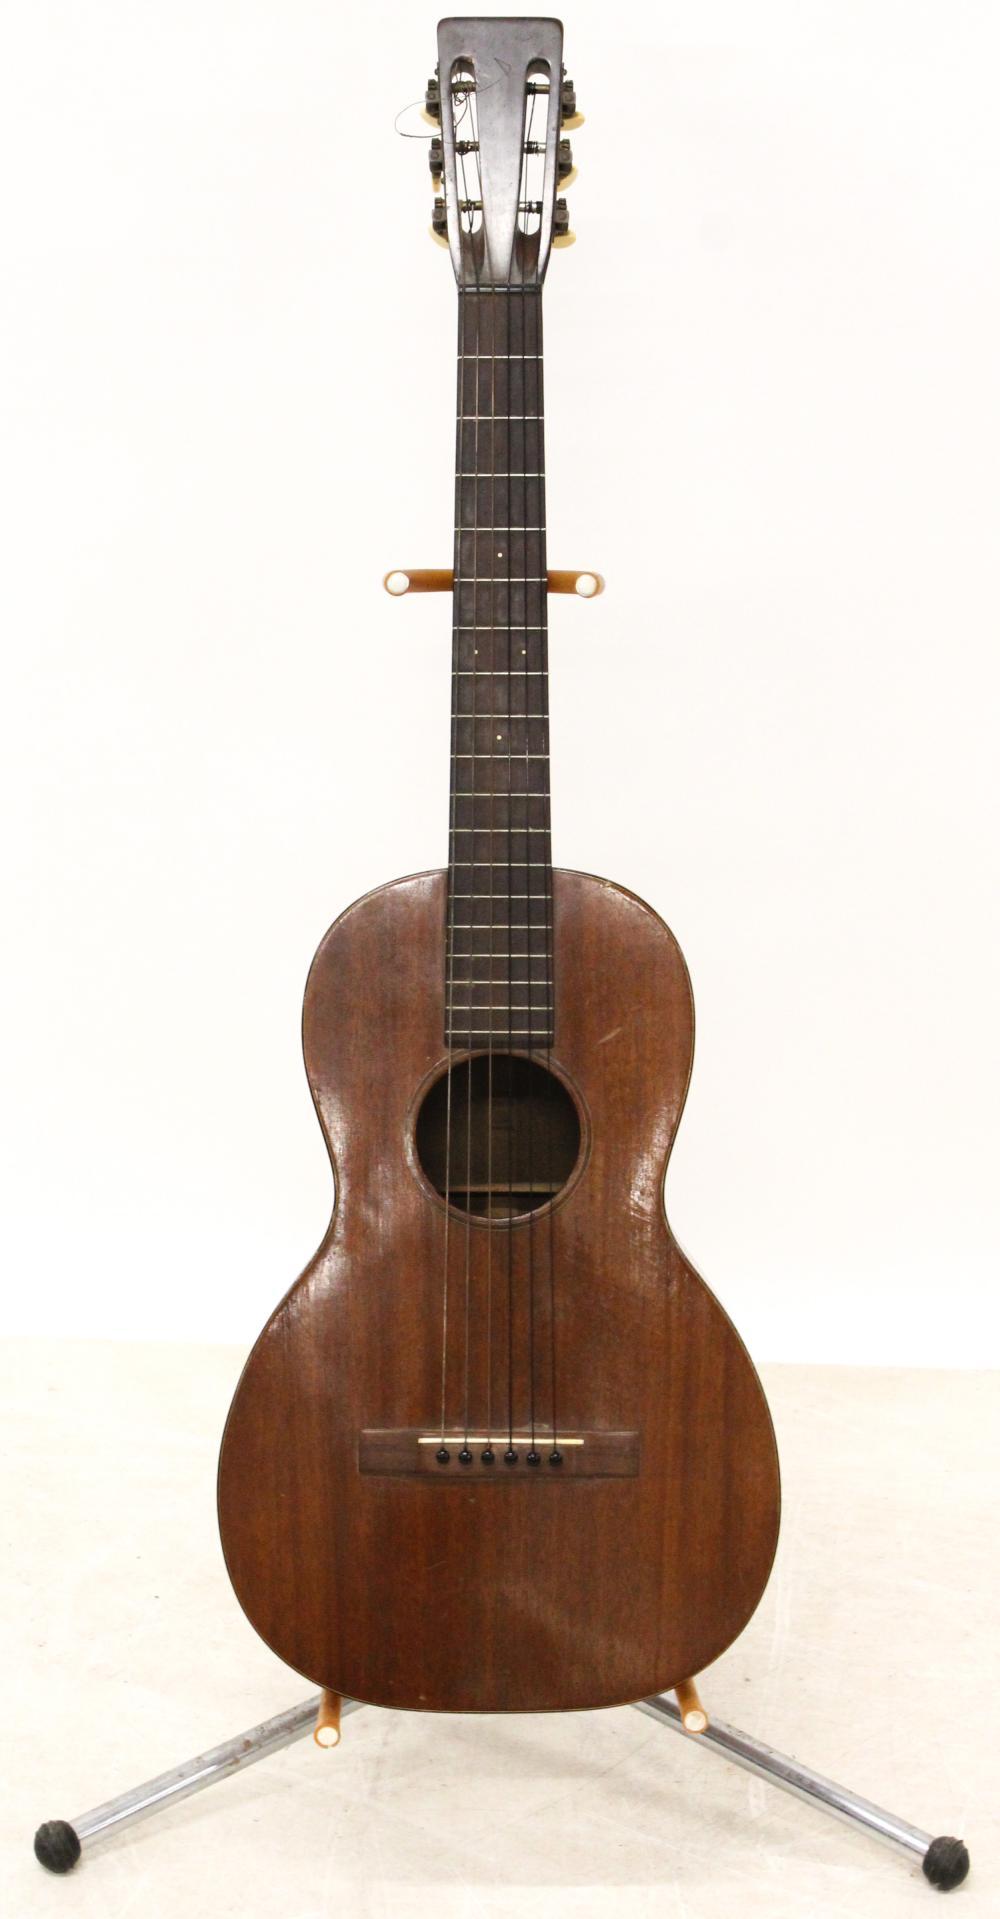 C F Martin/ Oliver Ditson Parlor Guitar